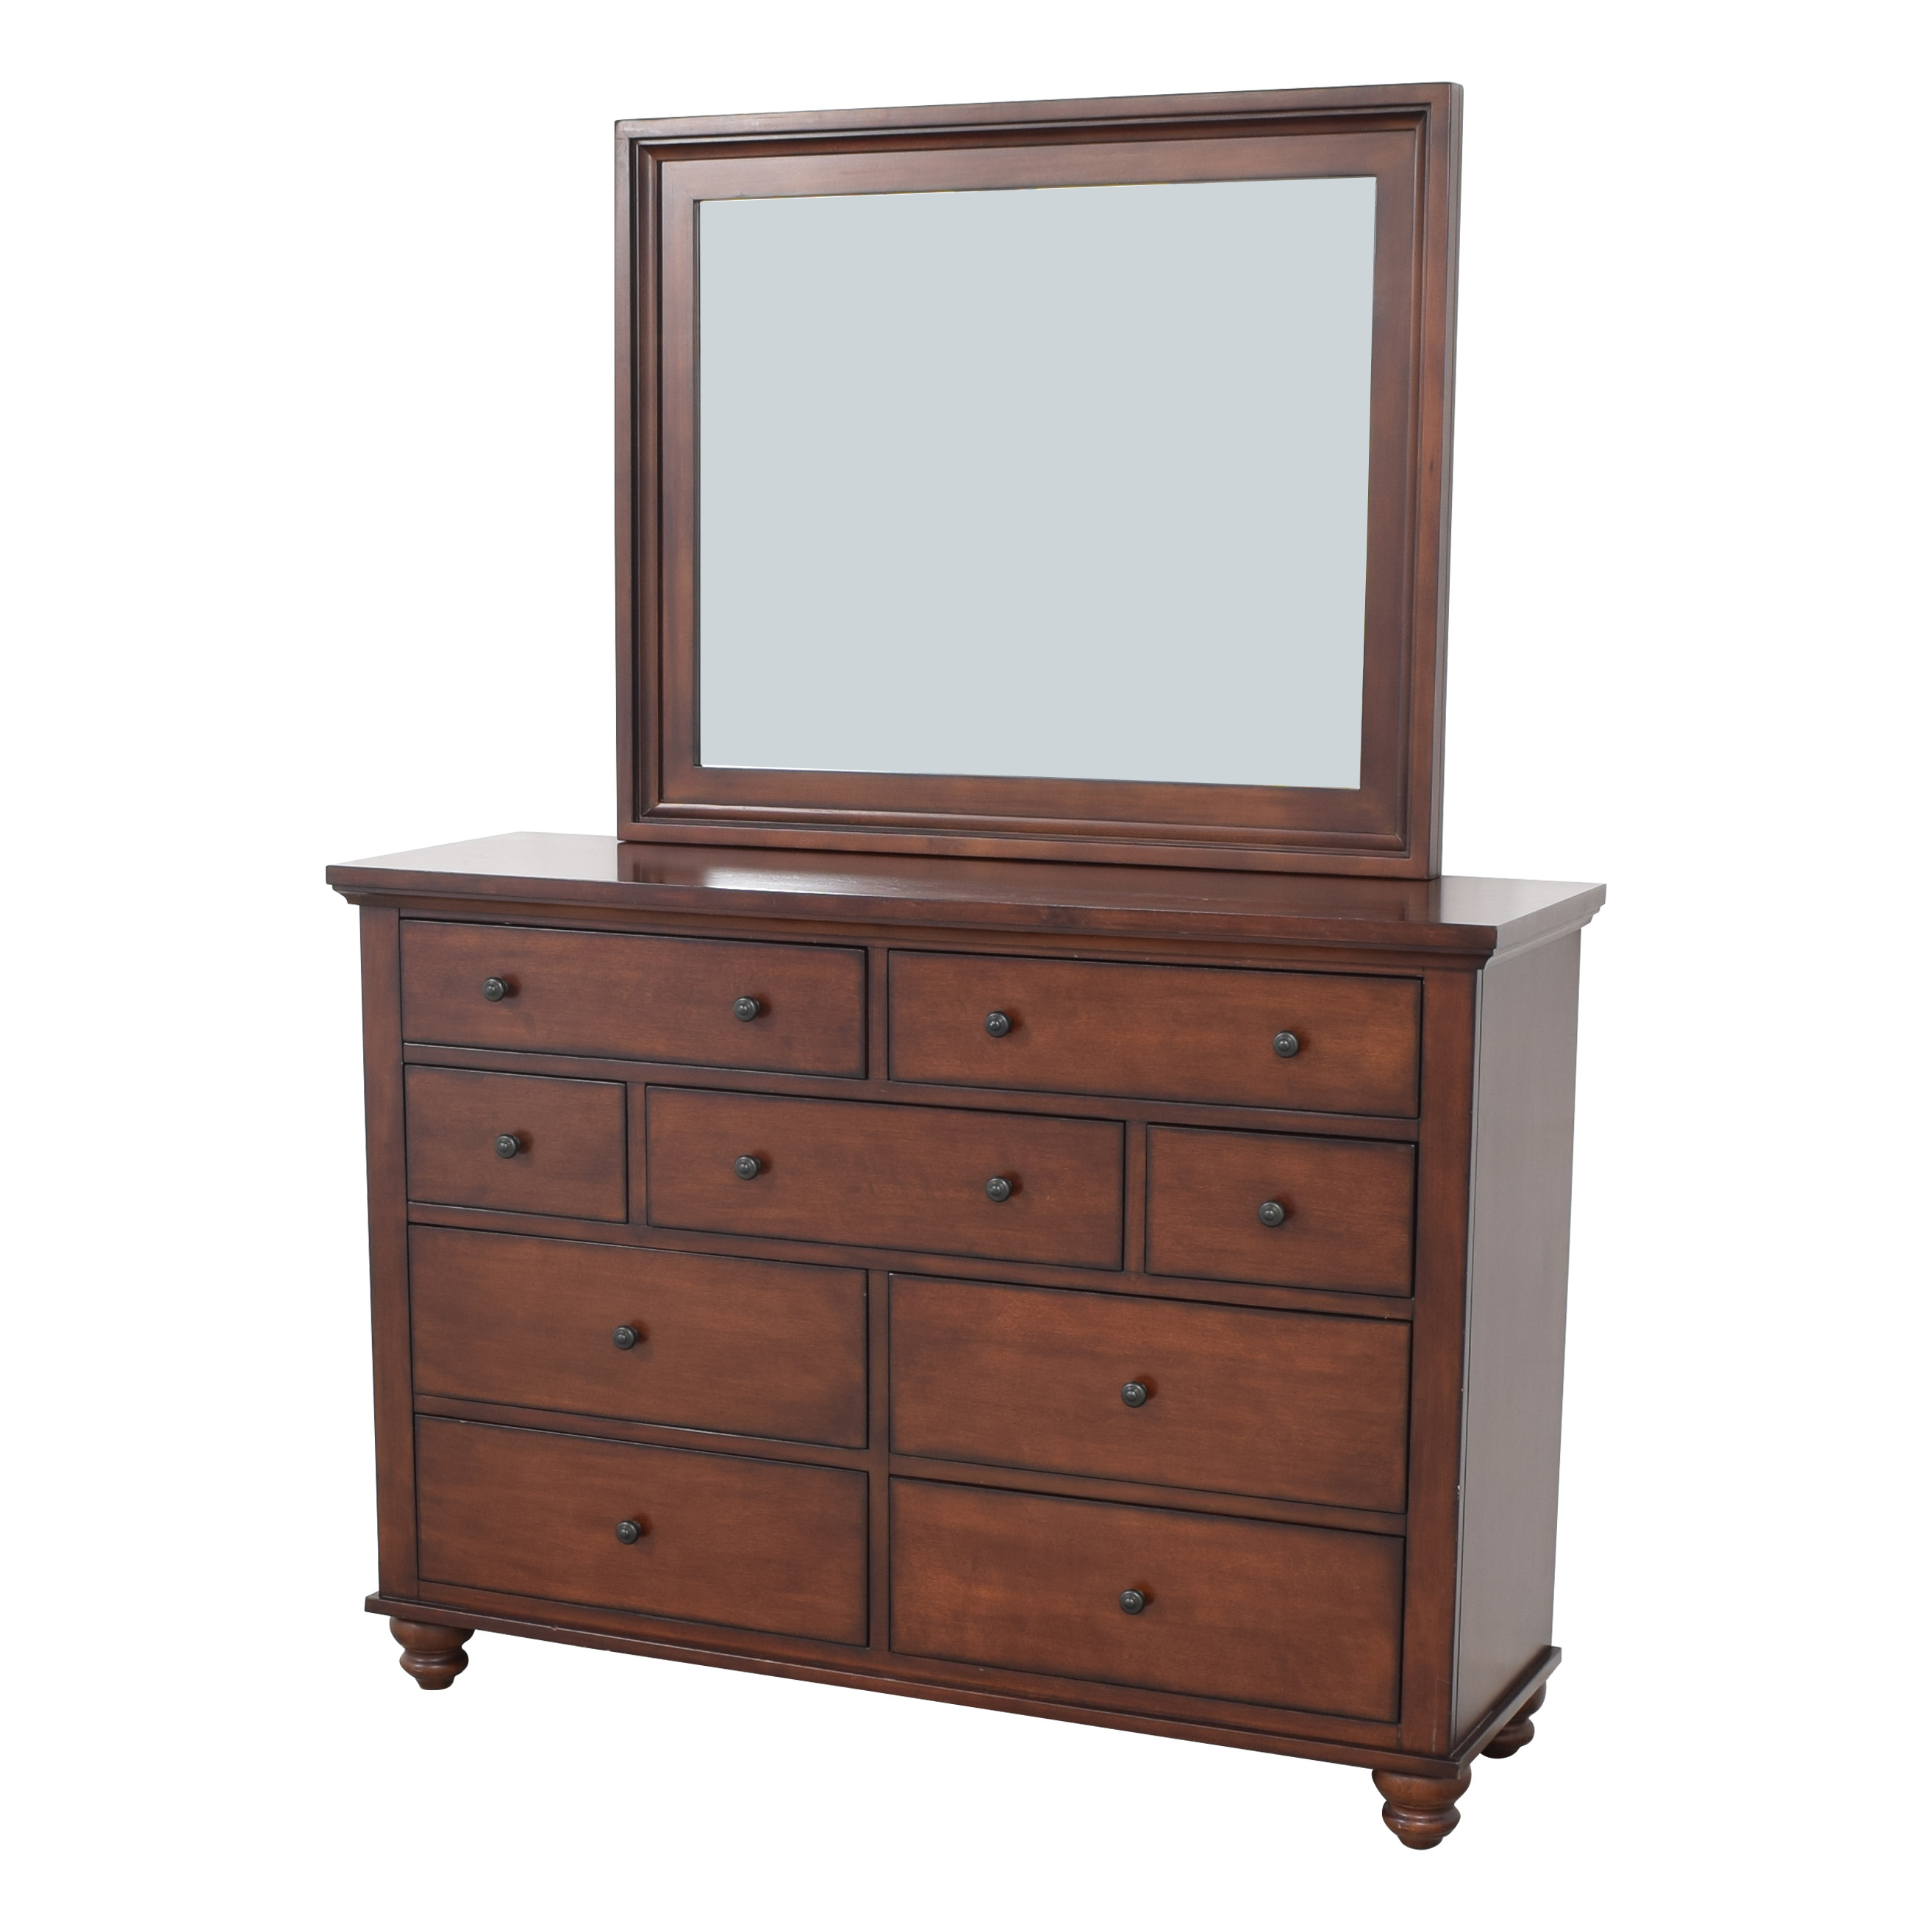 aspenhome Aspen Home Cambridge Dresser with Mirror second hand